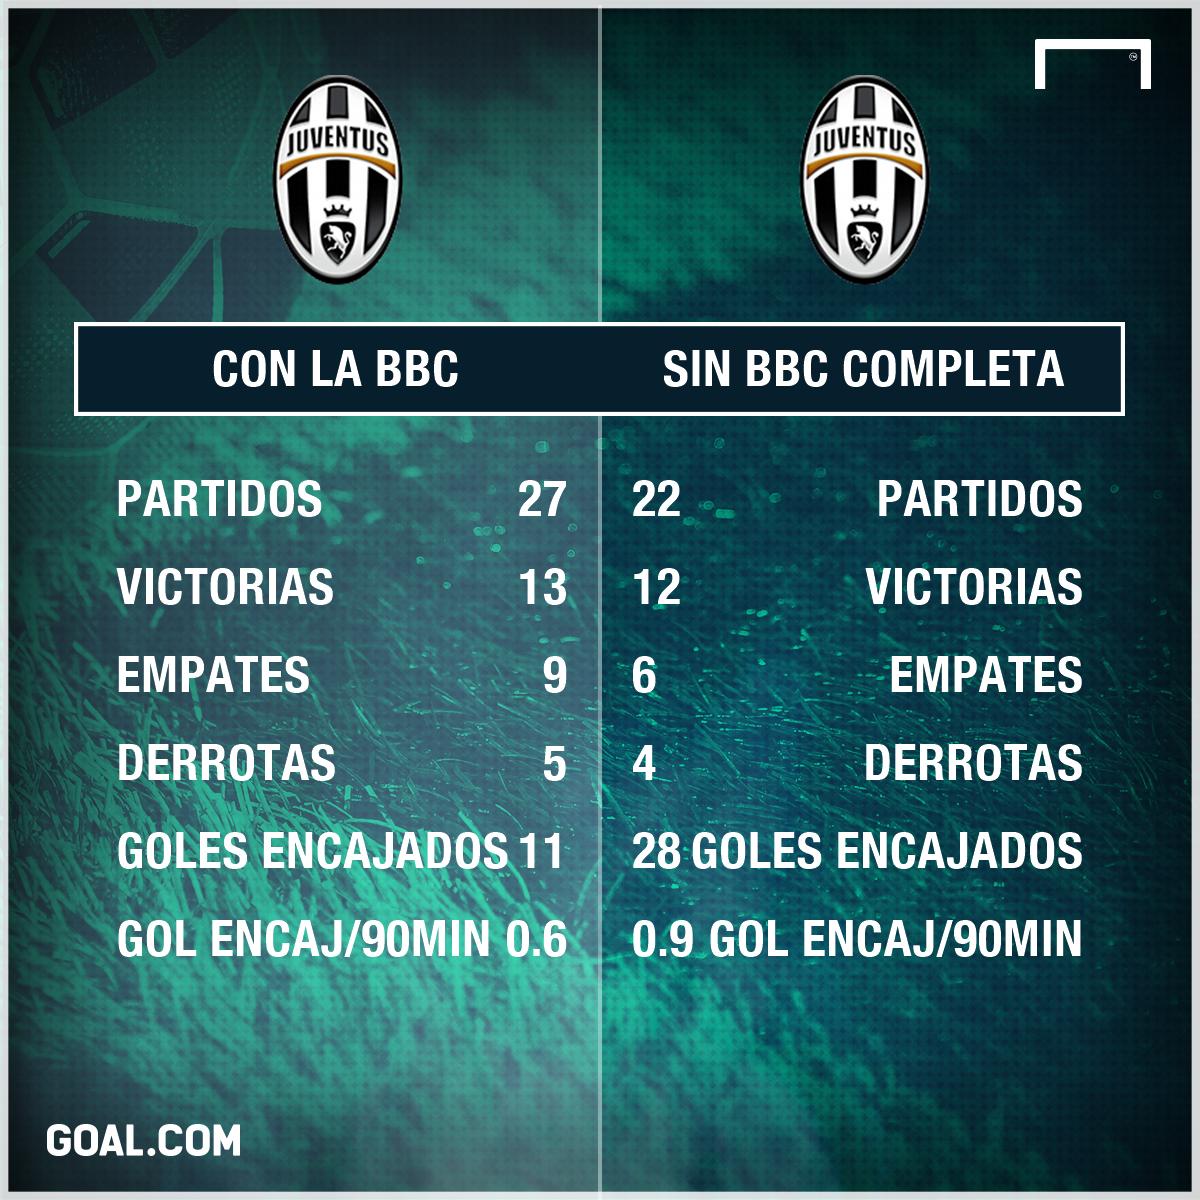 GFX BBC Juventus Spanish